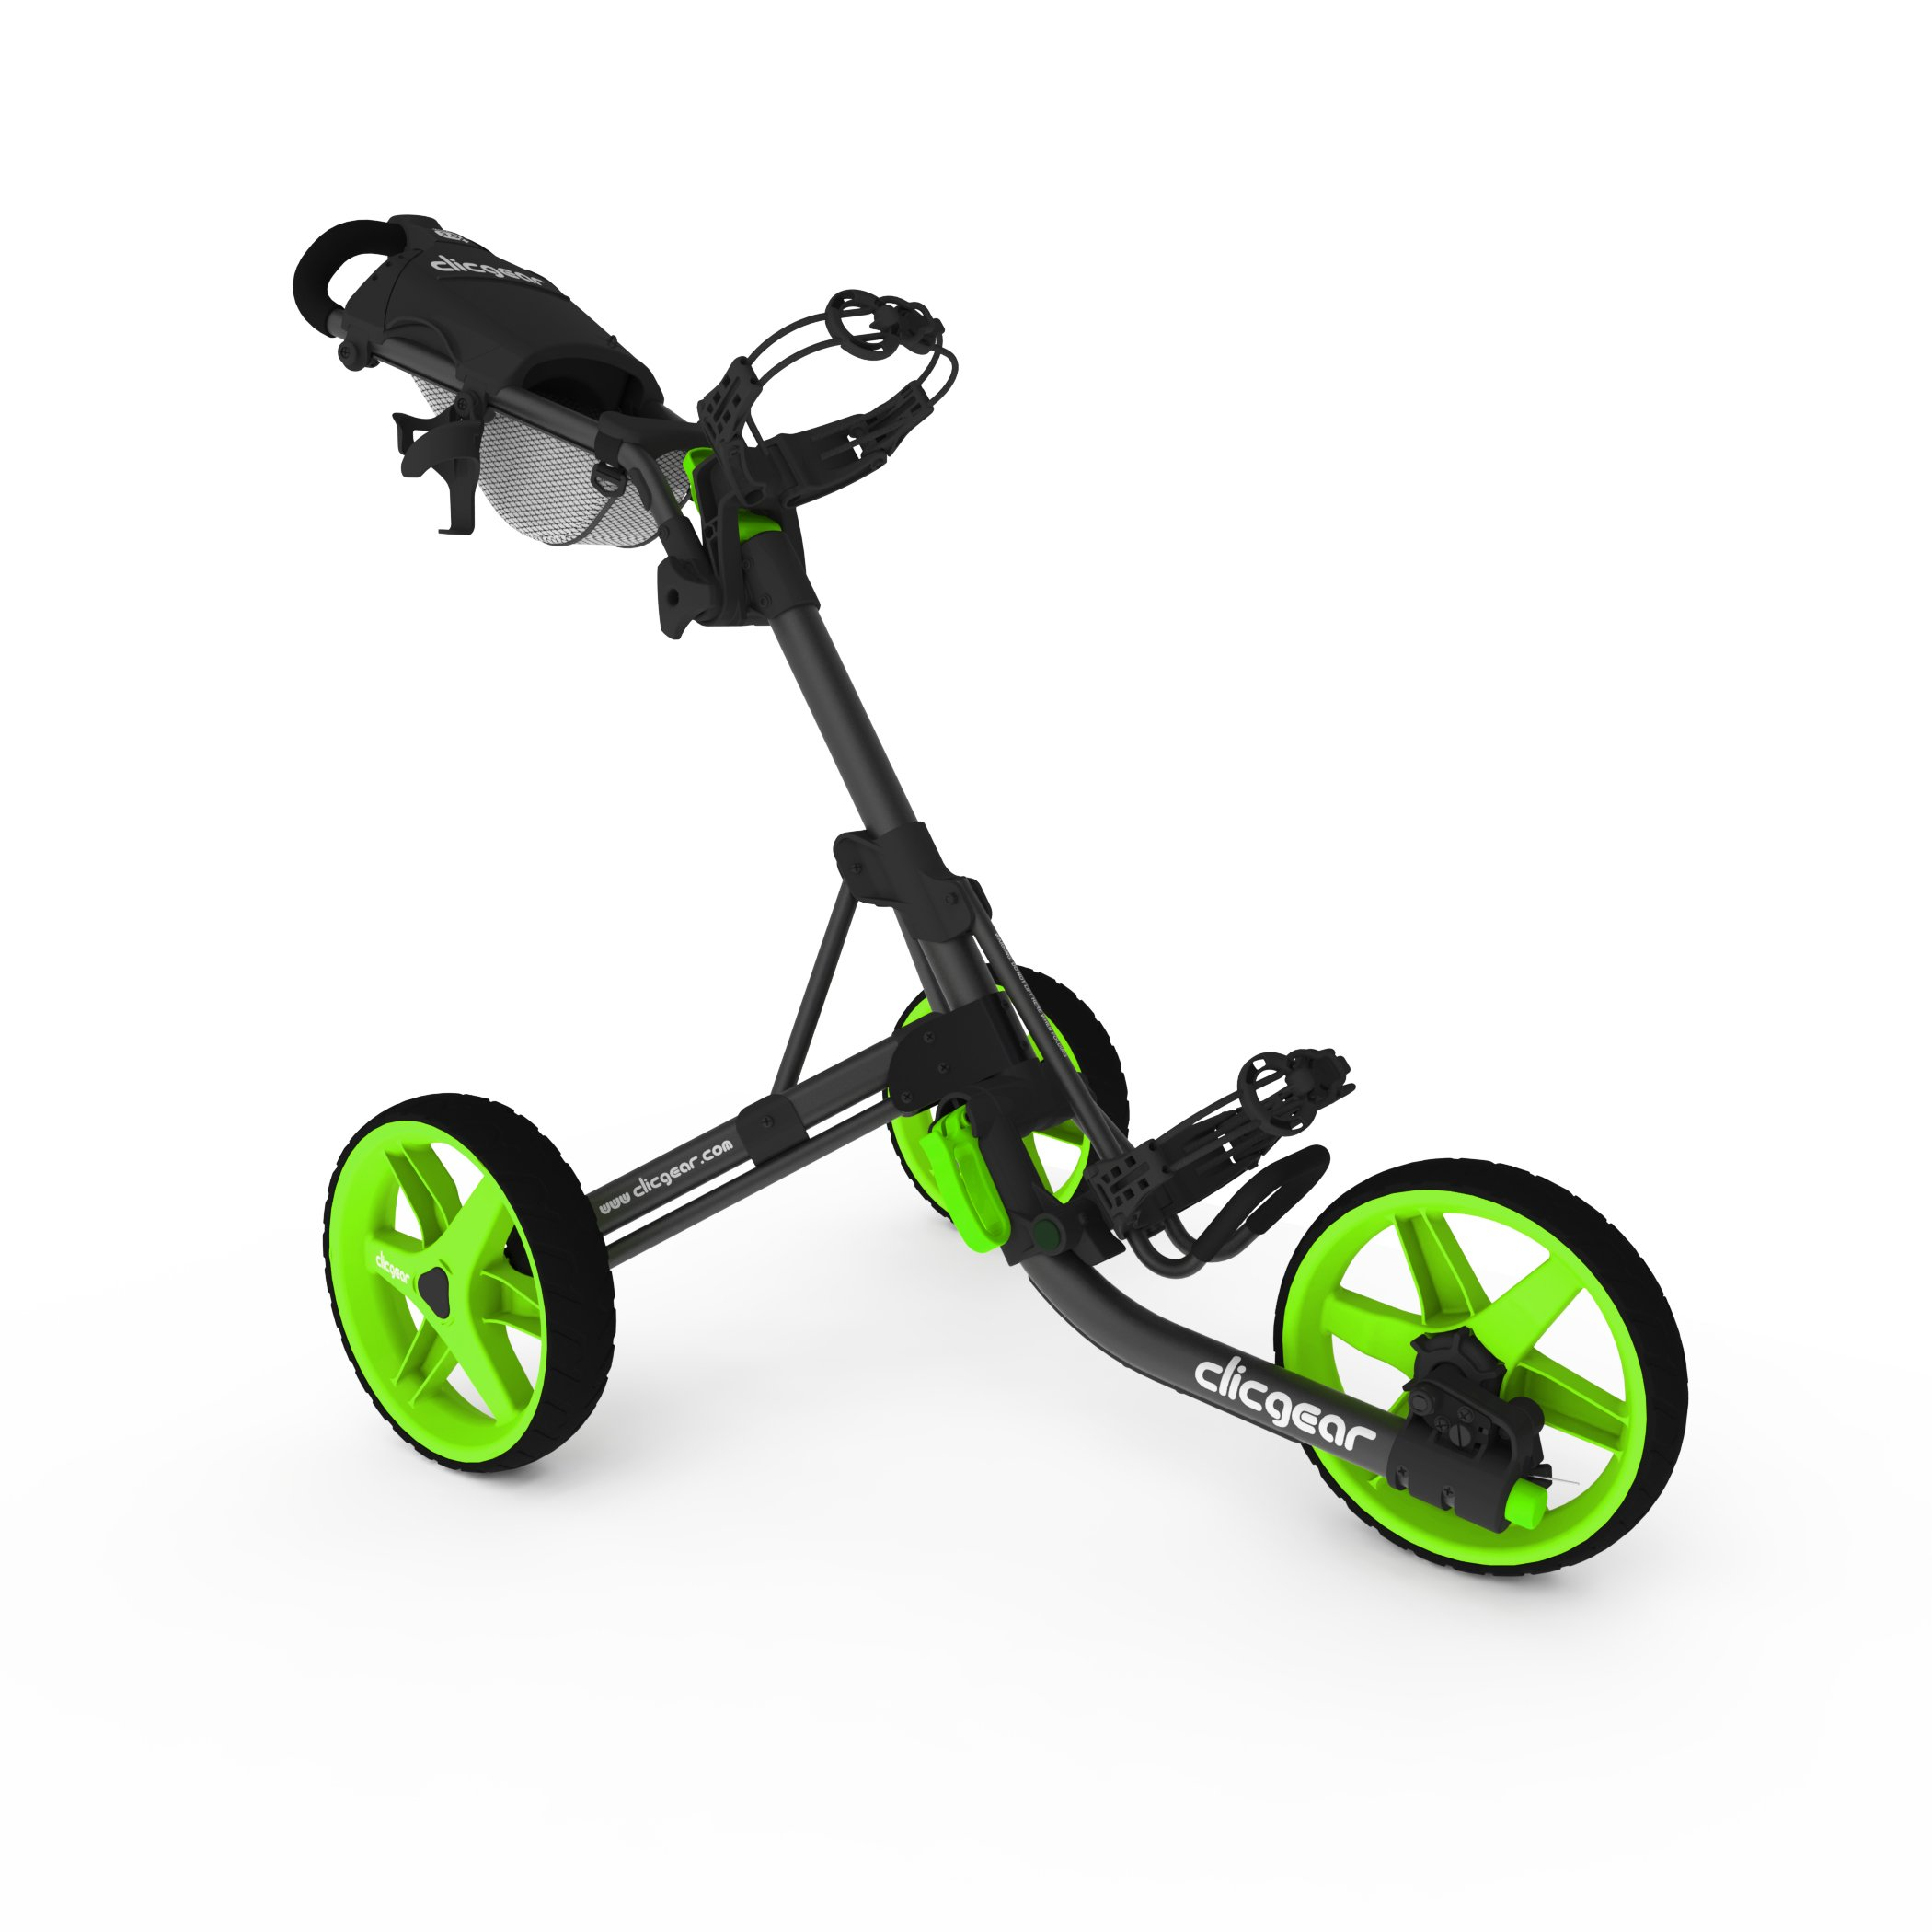 Clicgear Model 3.5+ | 3-Wheel Golf Push Cart (Charcoal/Lime) by Clicgear